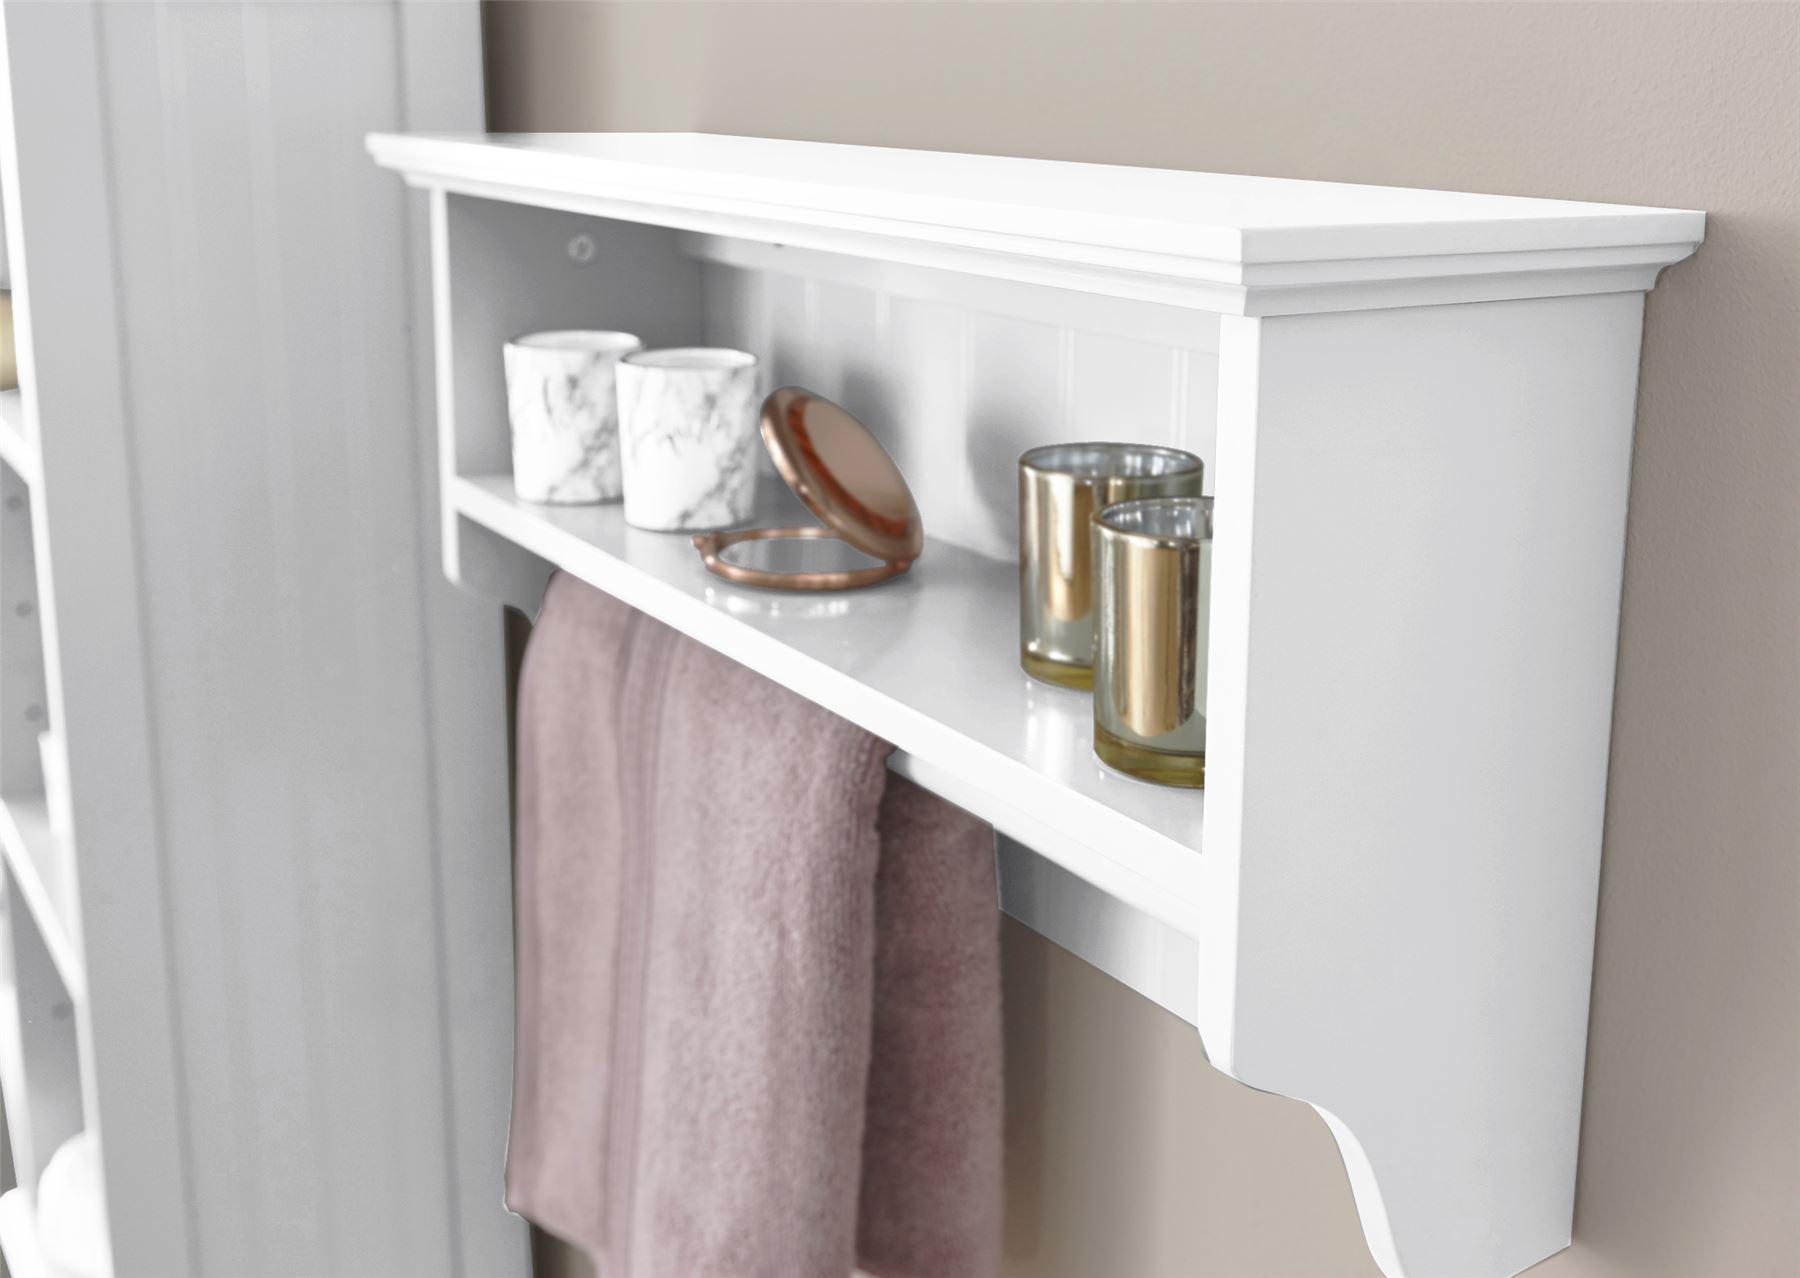 White Bathroom Furniture Cabinet Shelving Laundry Bin Mirror Door Medicine Sink: COLONIAL RANGE BATHROOM FURNITURE CUPBOARD UNDER BASIN